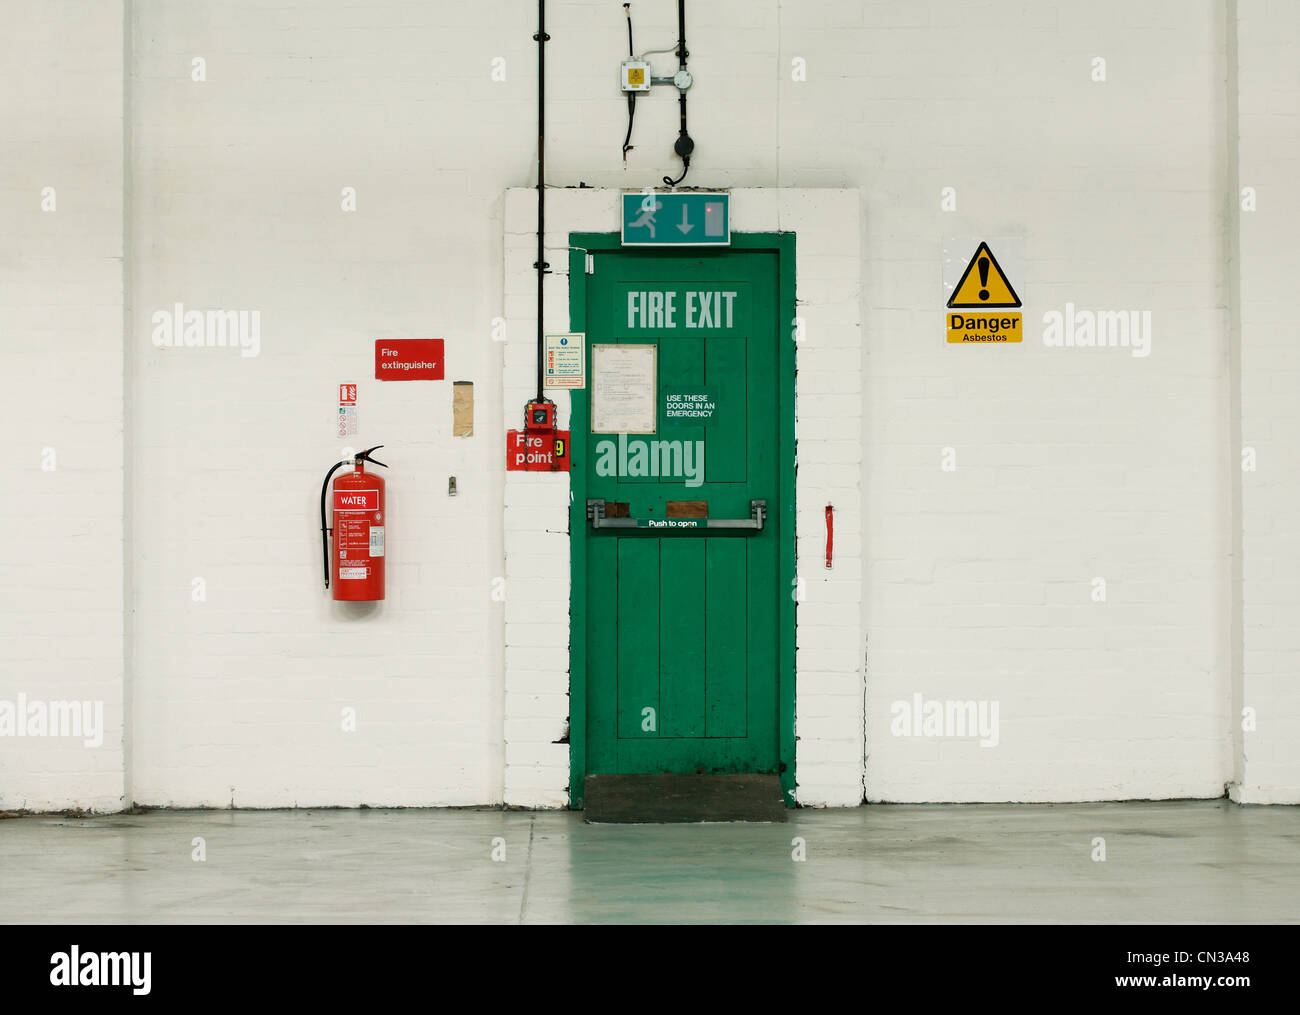 Fire Exit Door And Signs In Industrial Building Stock